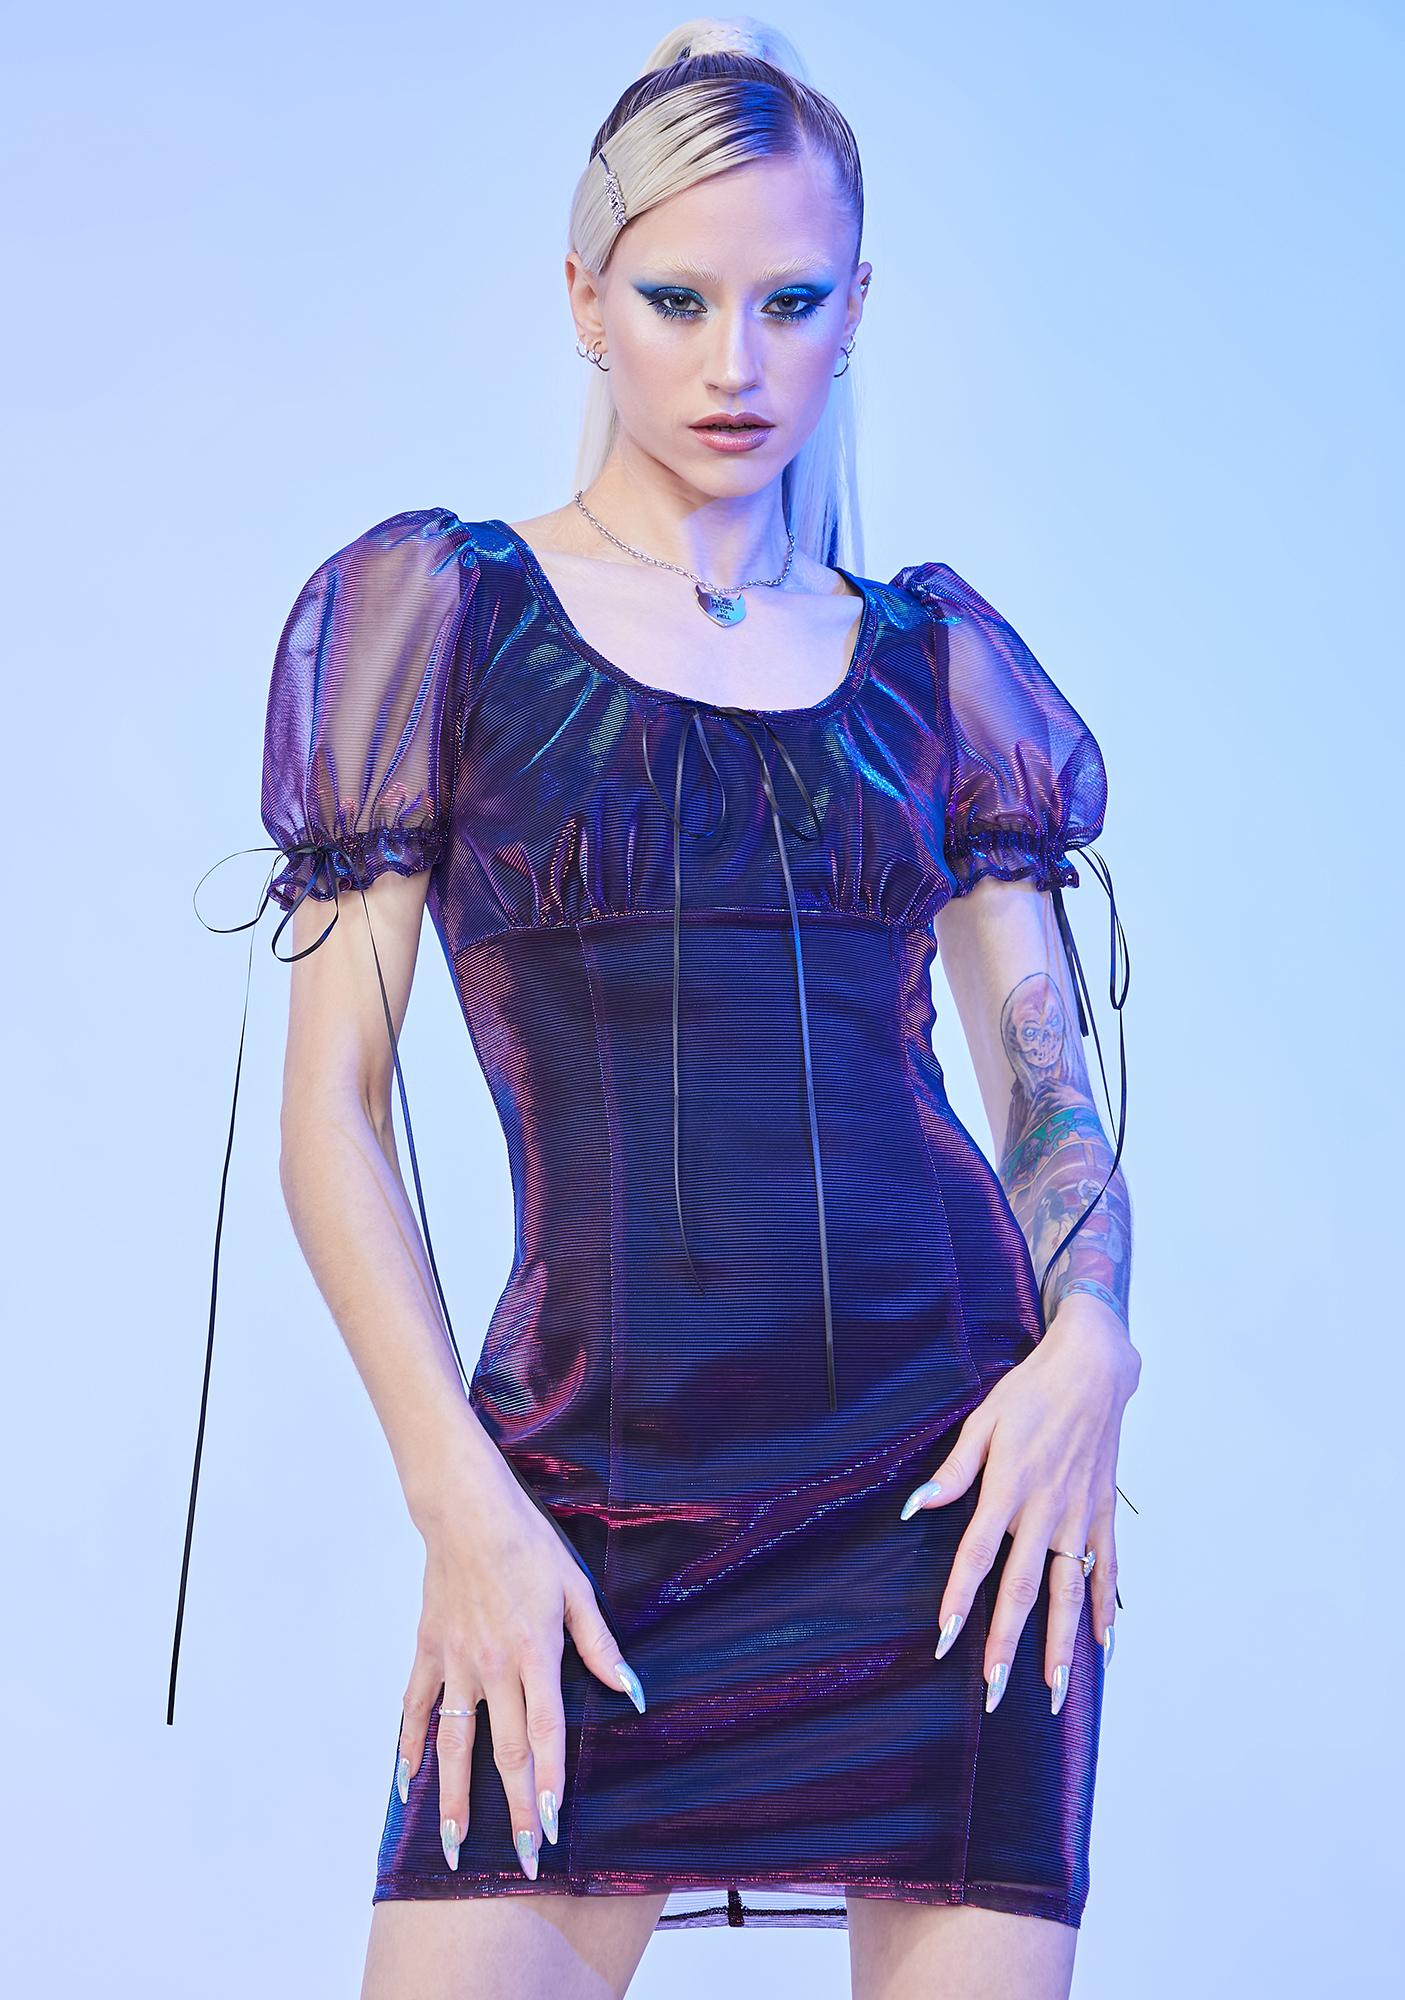 HOROSCOPEZ All The Stars Puff Sleeve Mini Dress